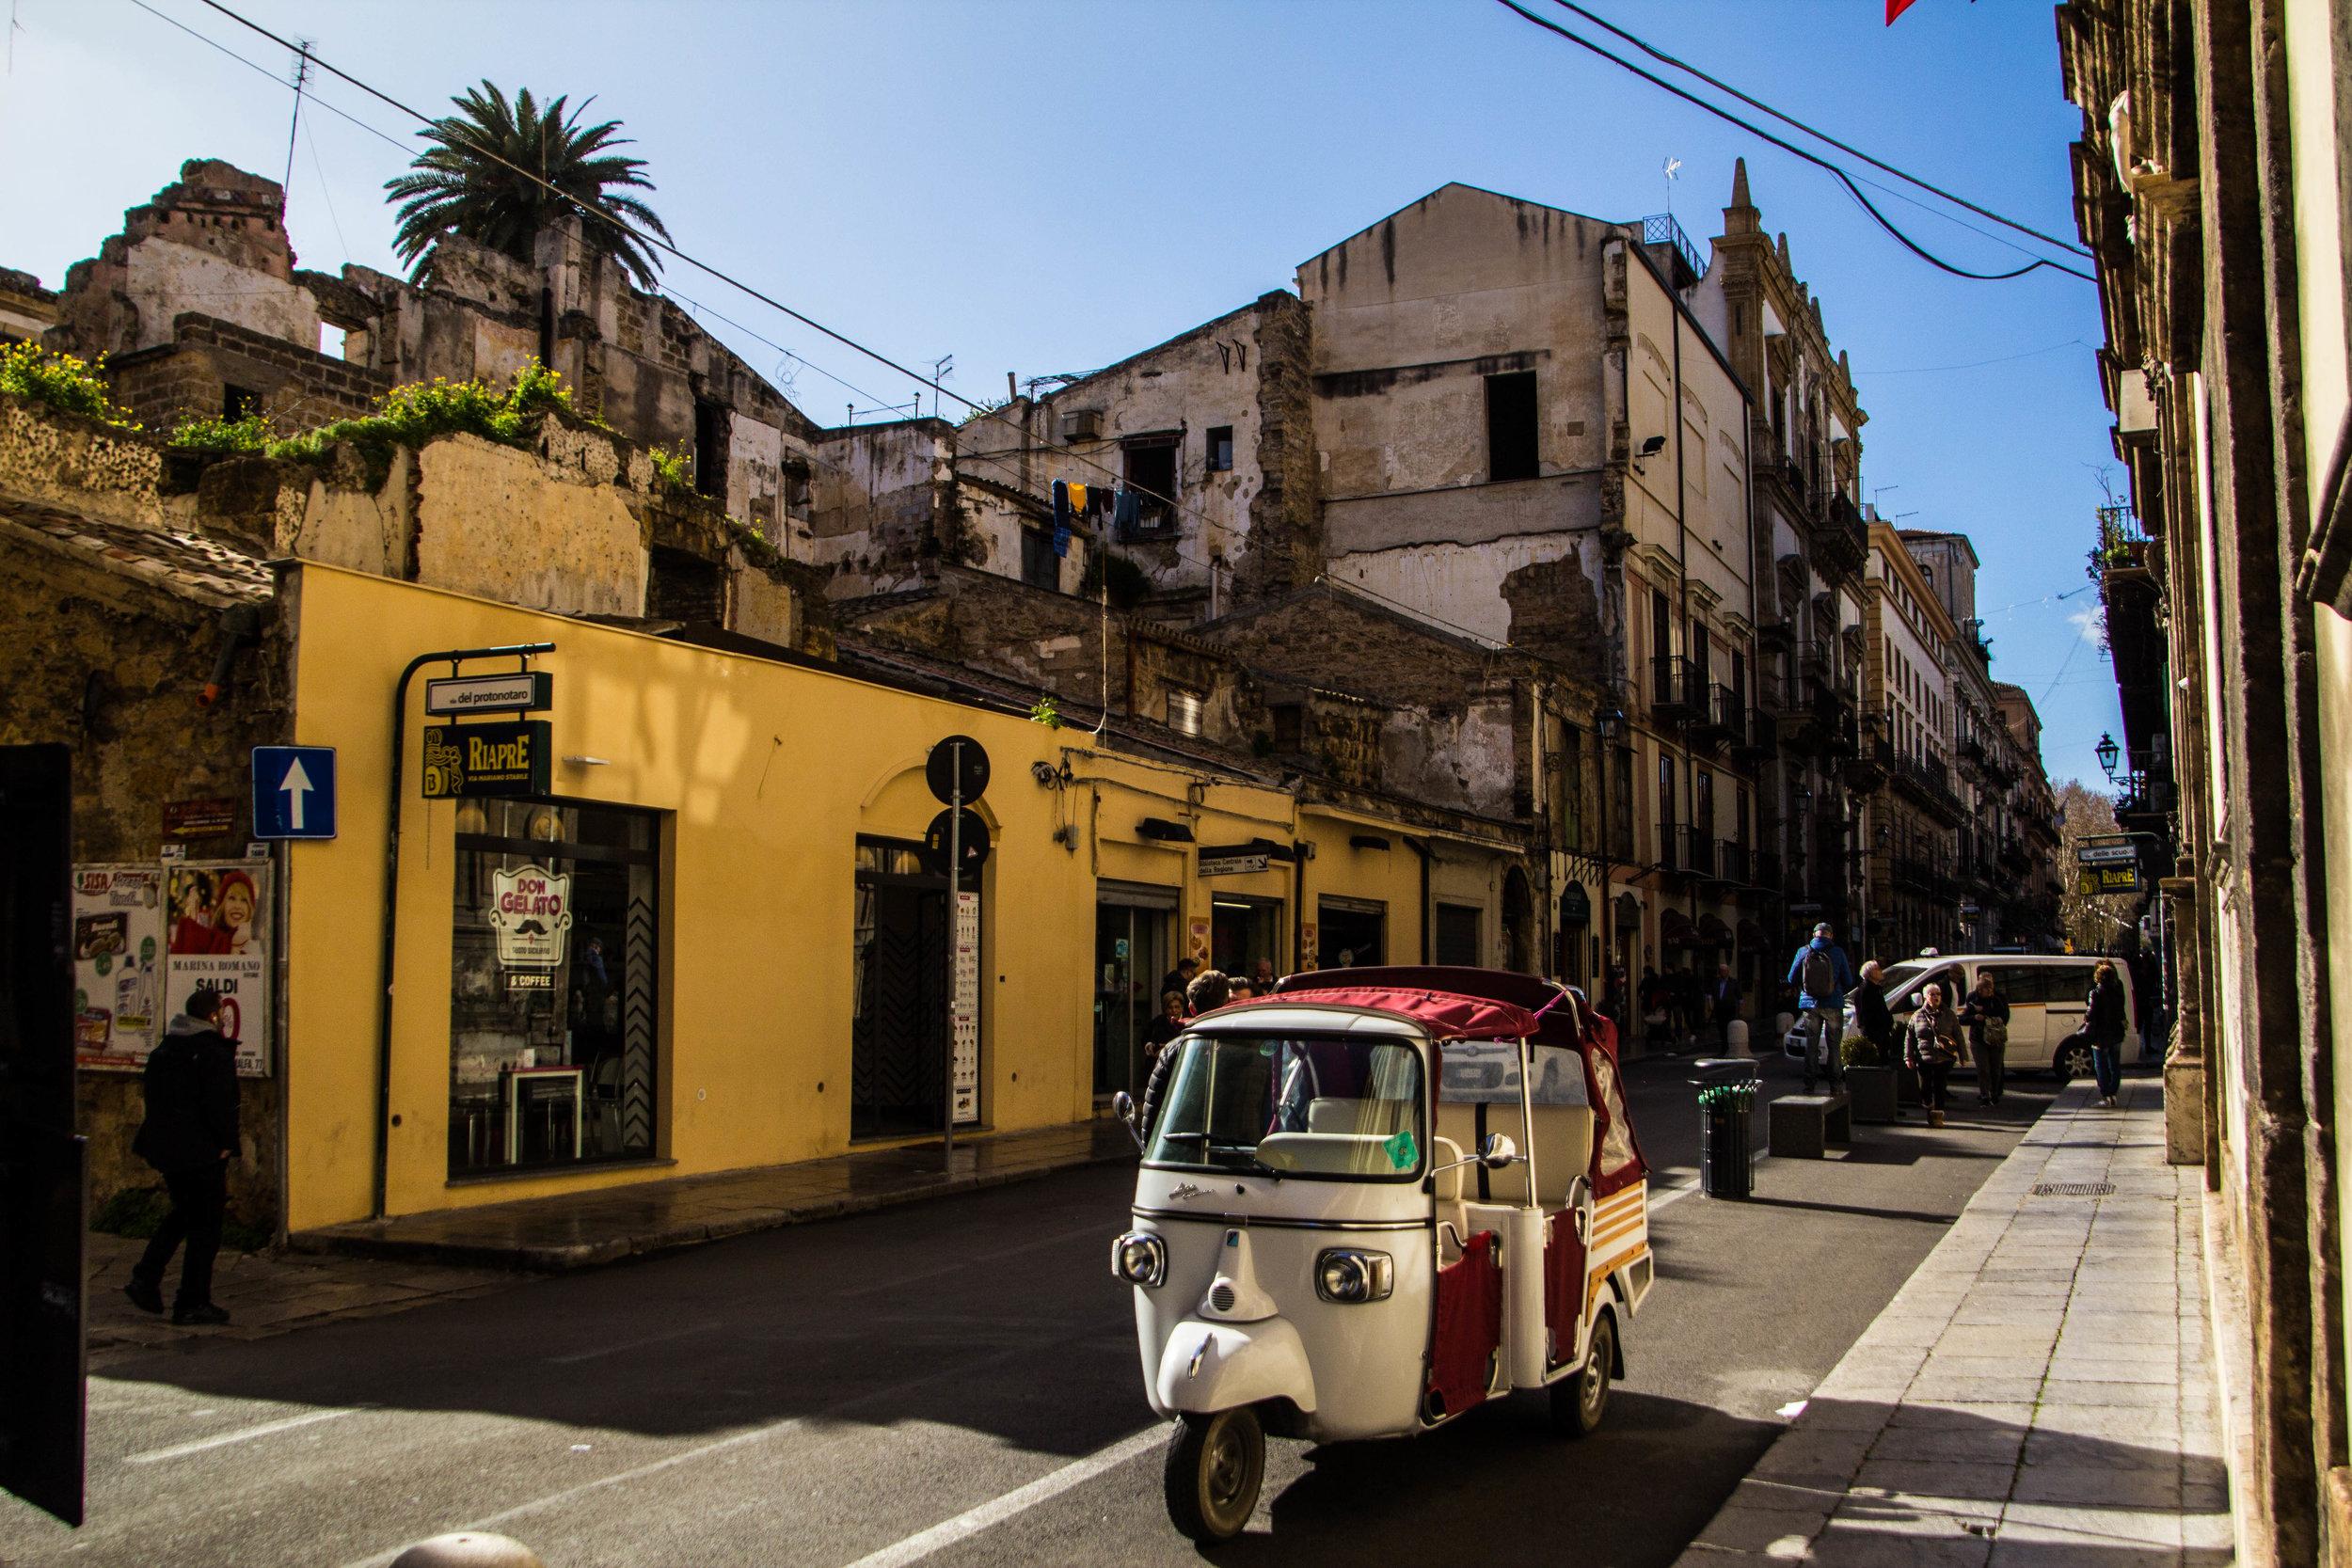 palermo-sicily-street-photography-1.jpg